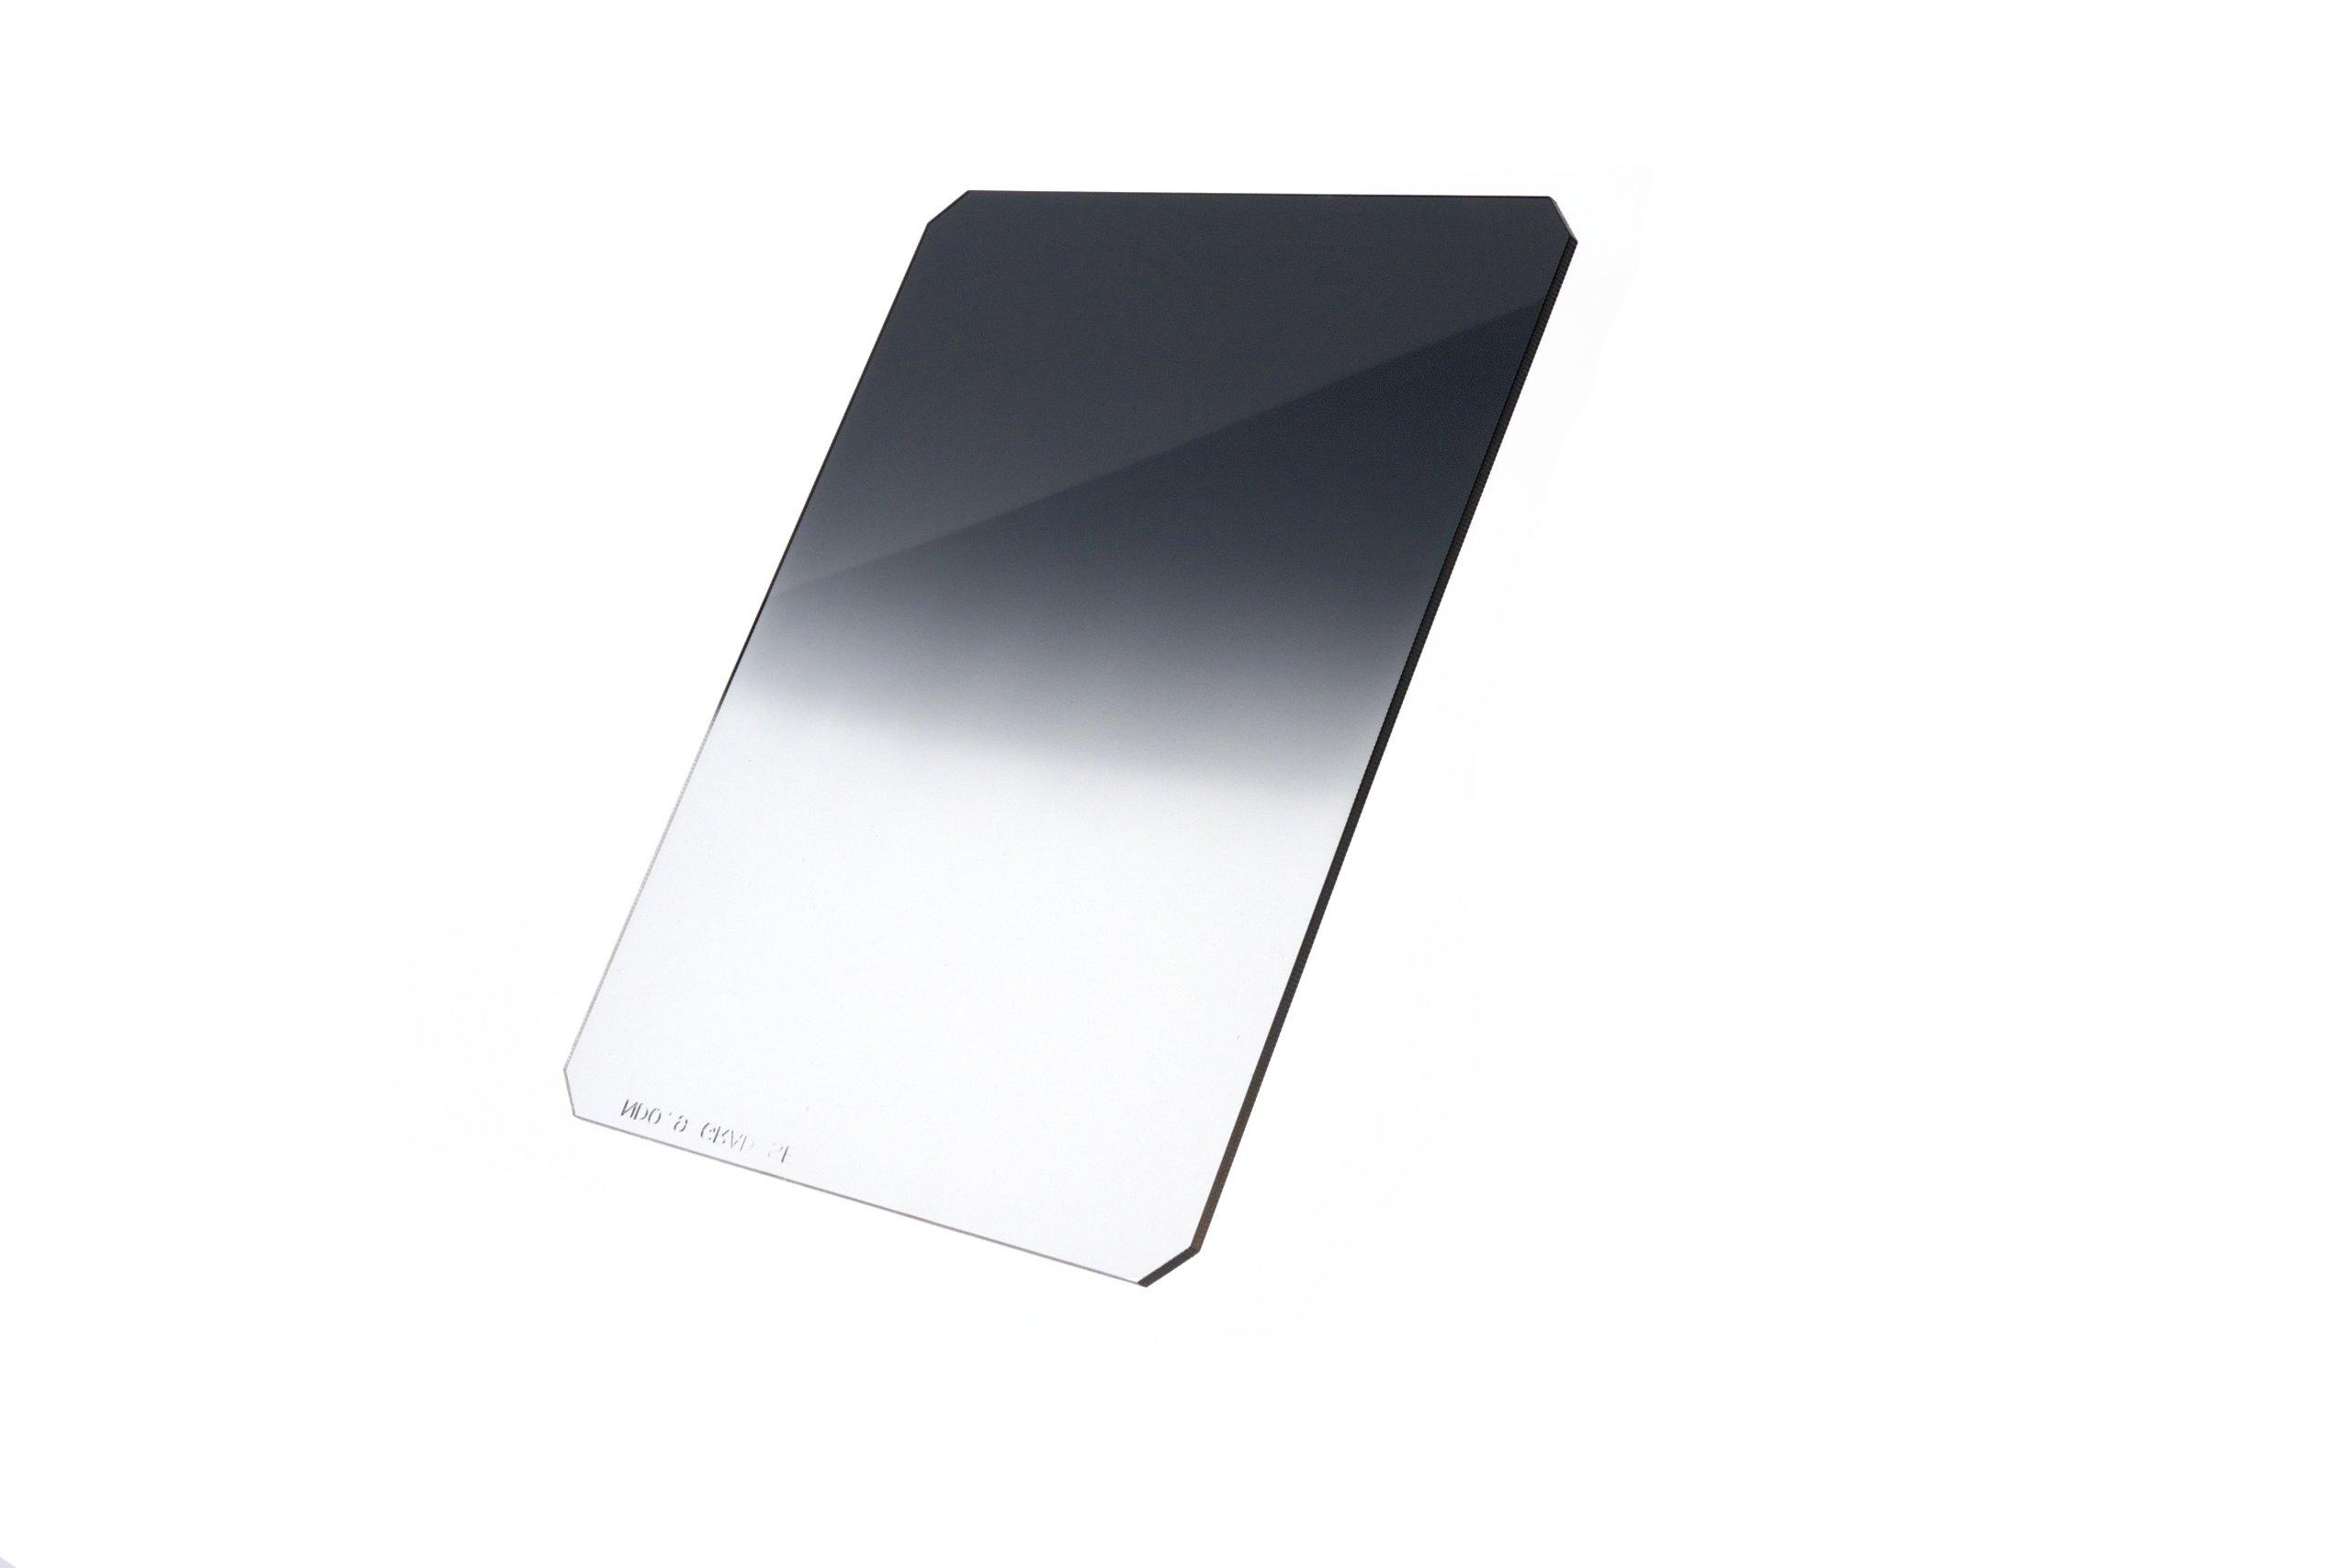 3.35x3.35 Formatt-Hitech 85x85mm Resin Black and White 21 Orange